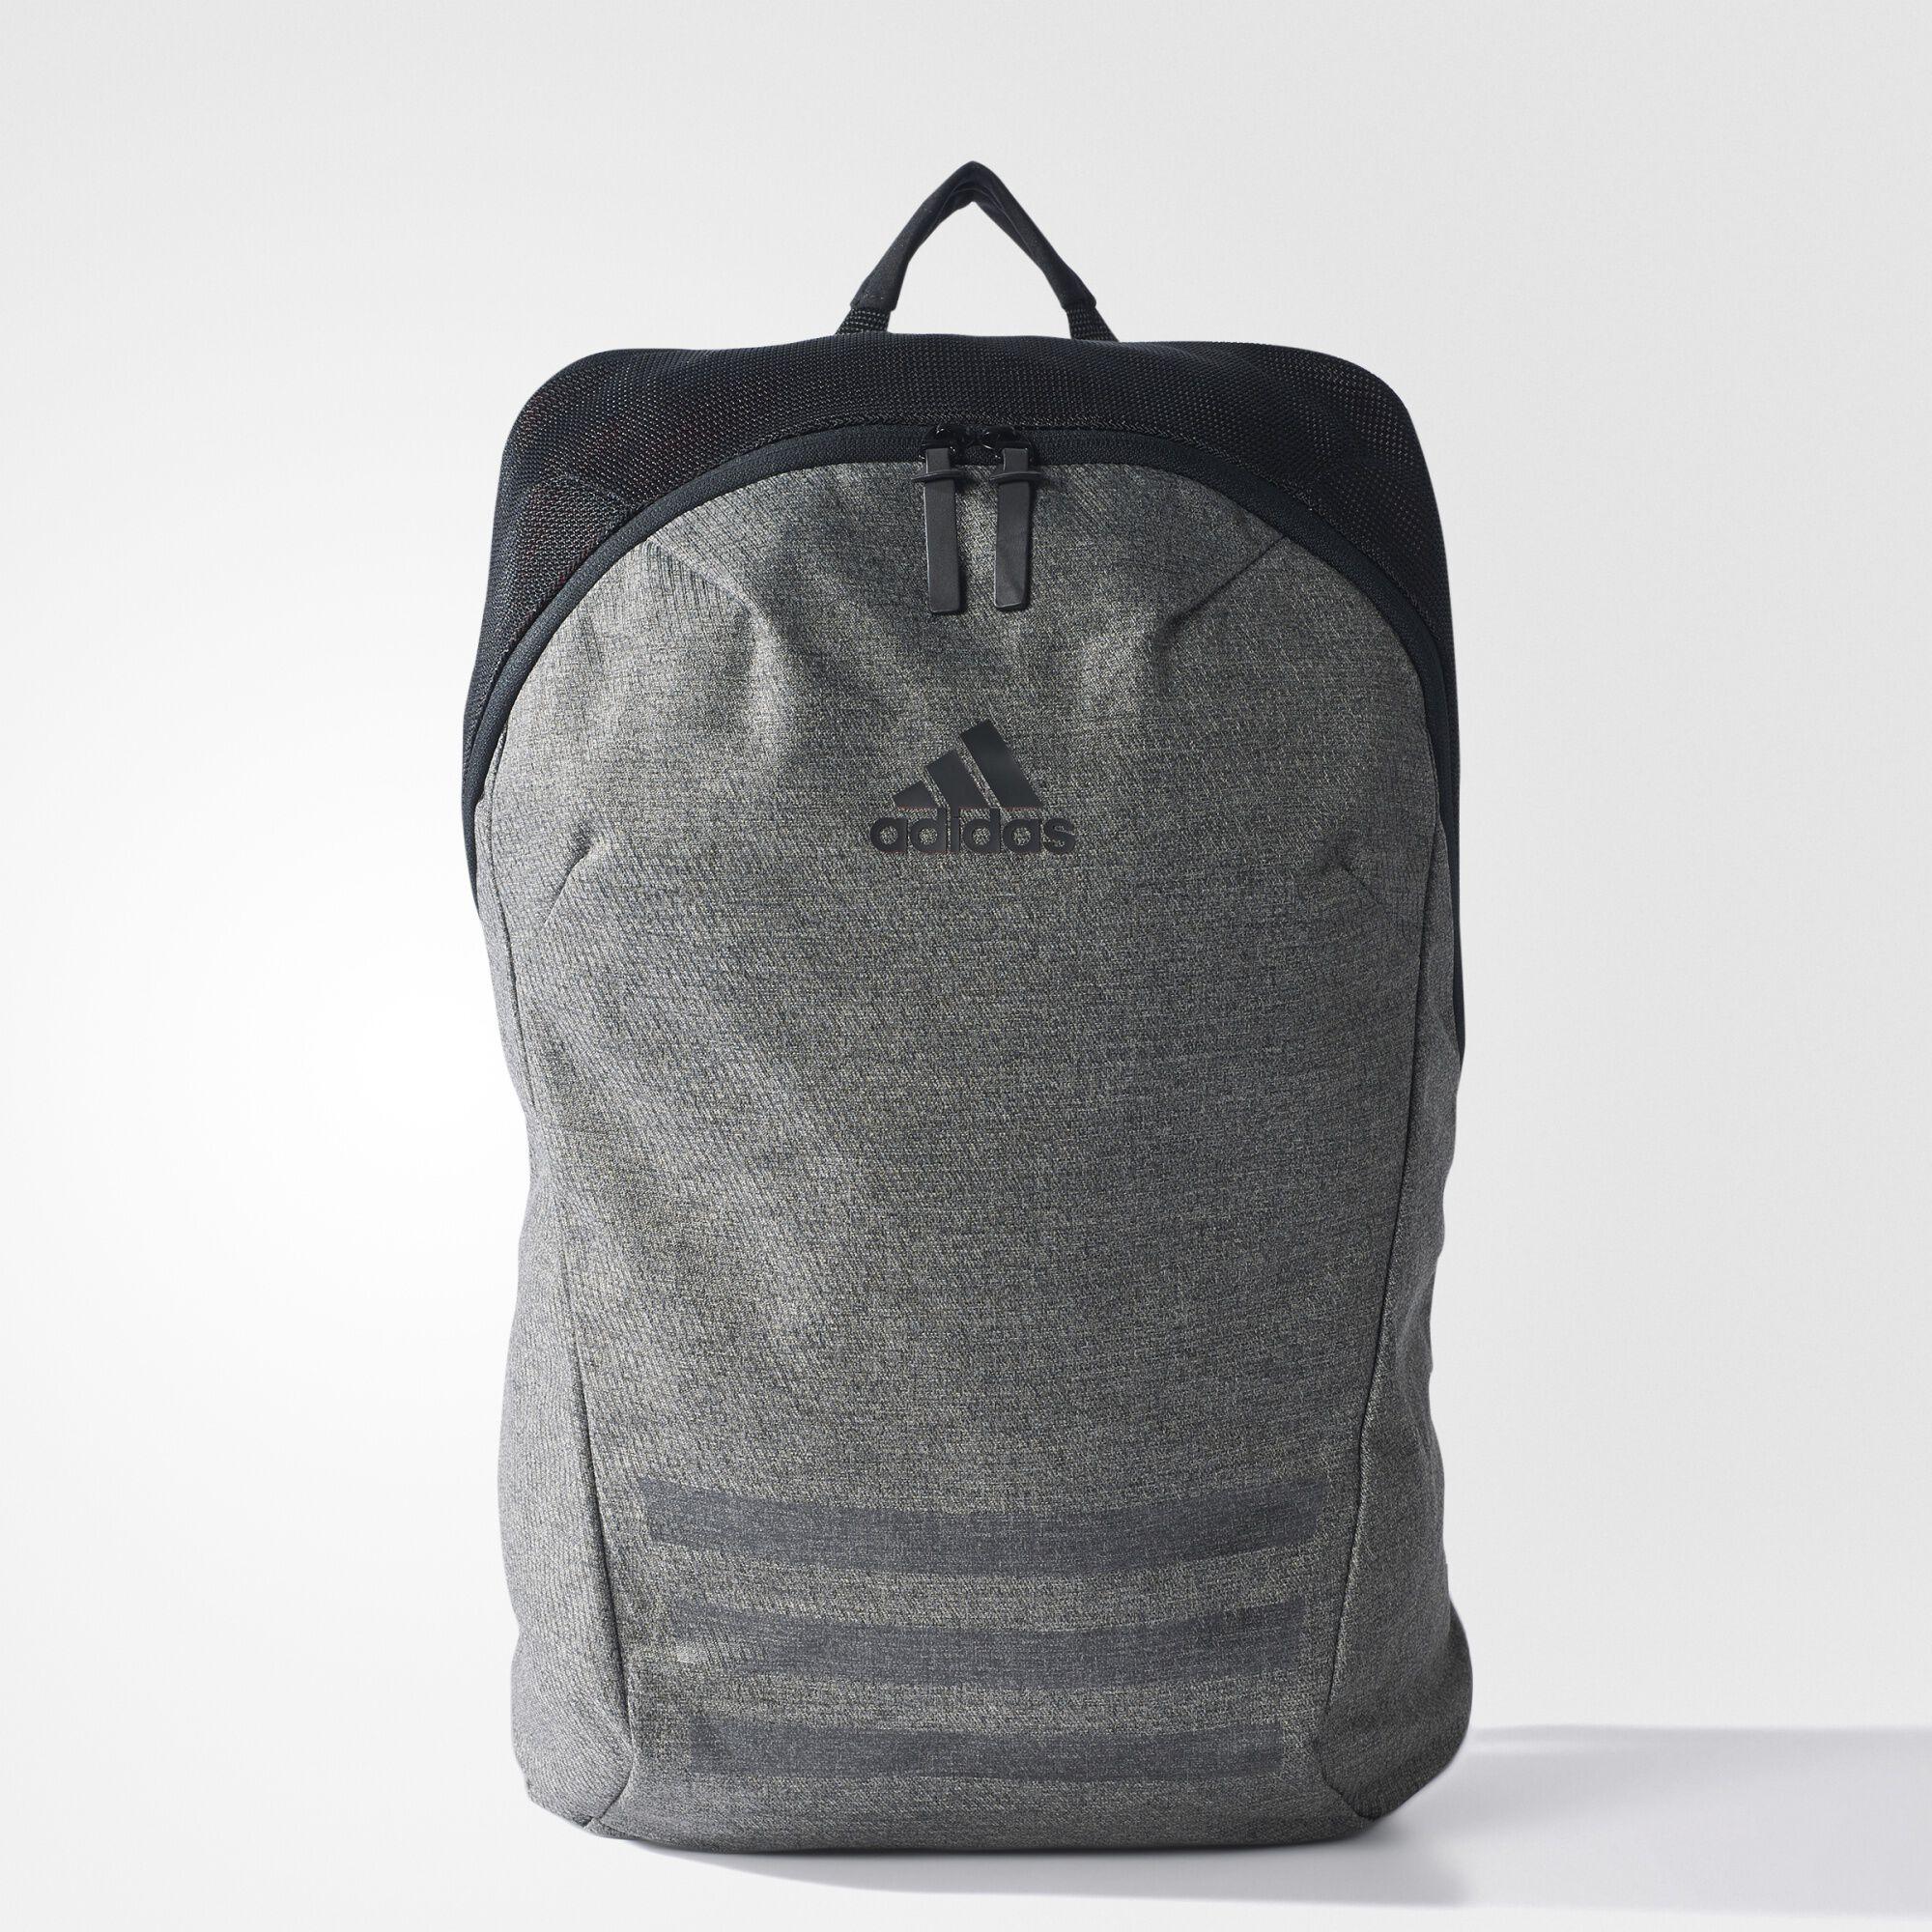 adidas shoe bag,adidas shoes official